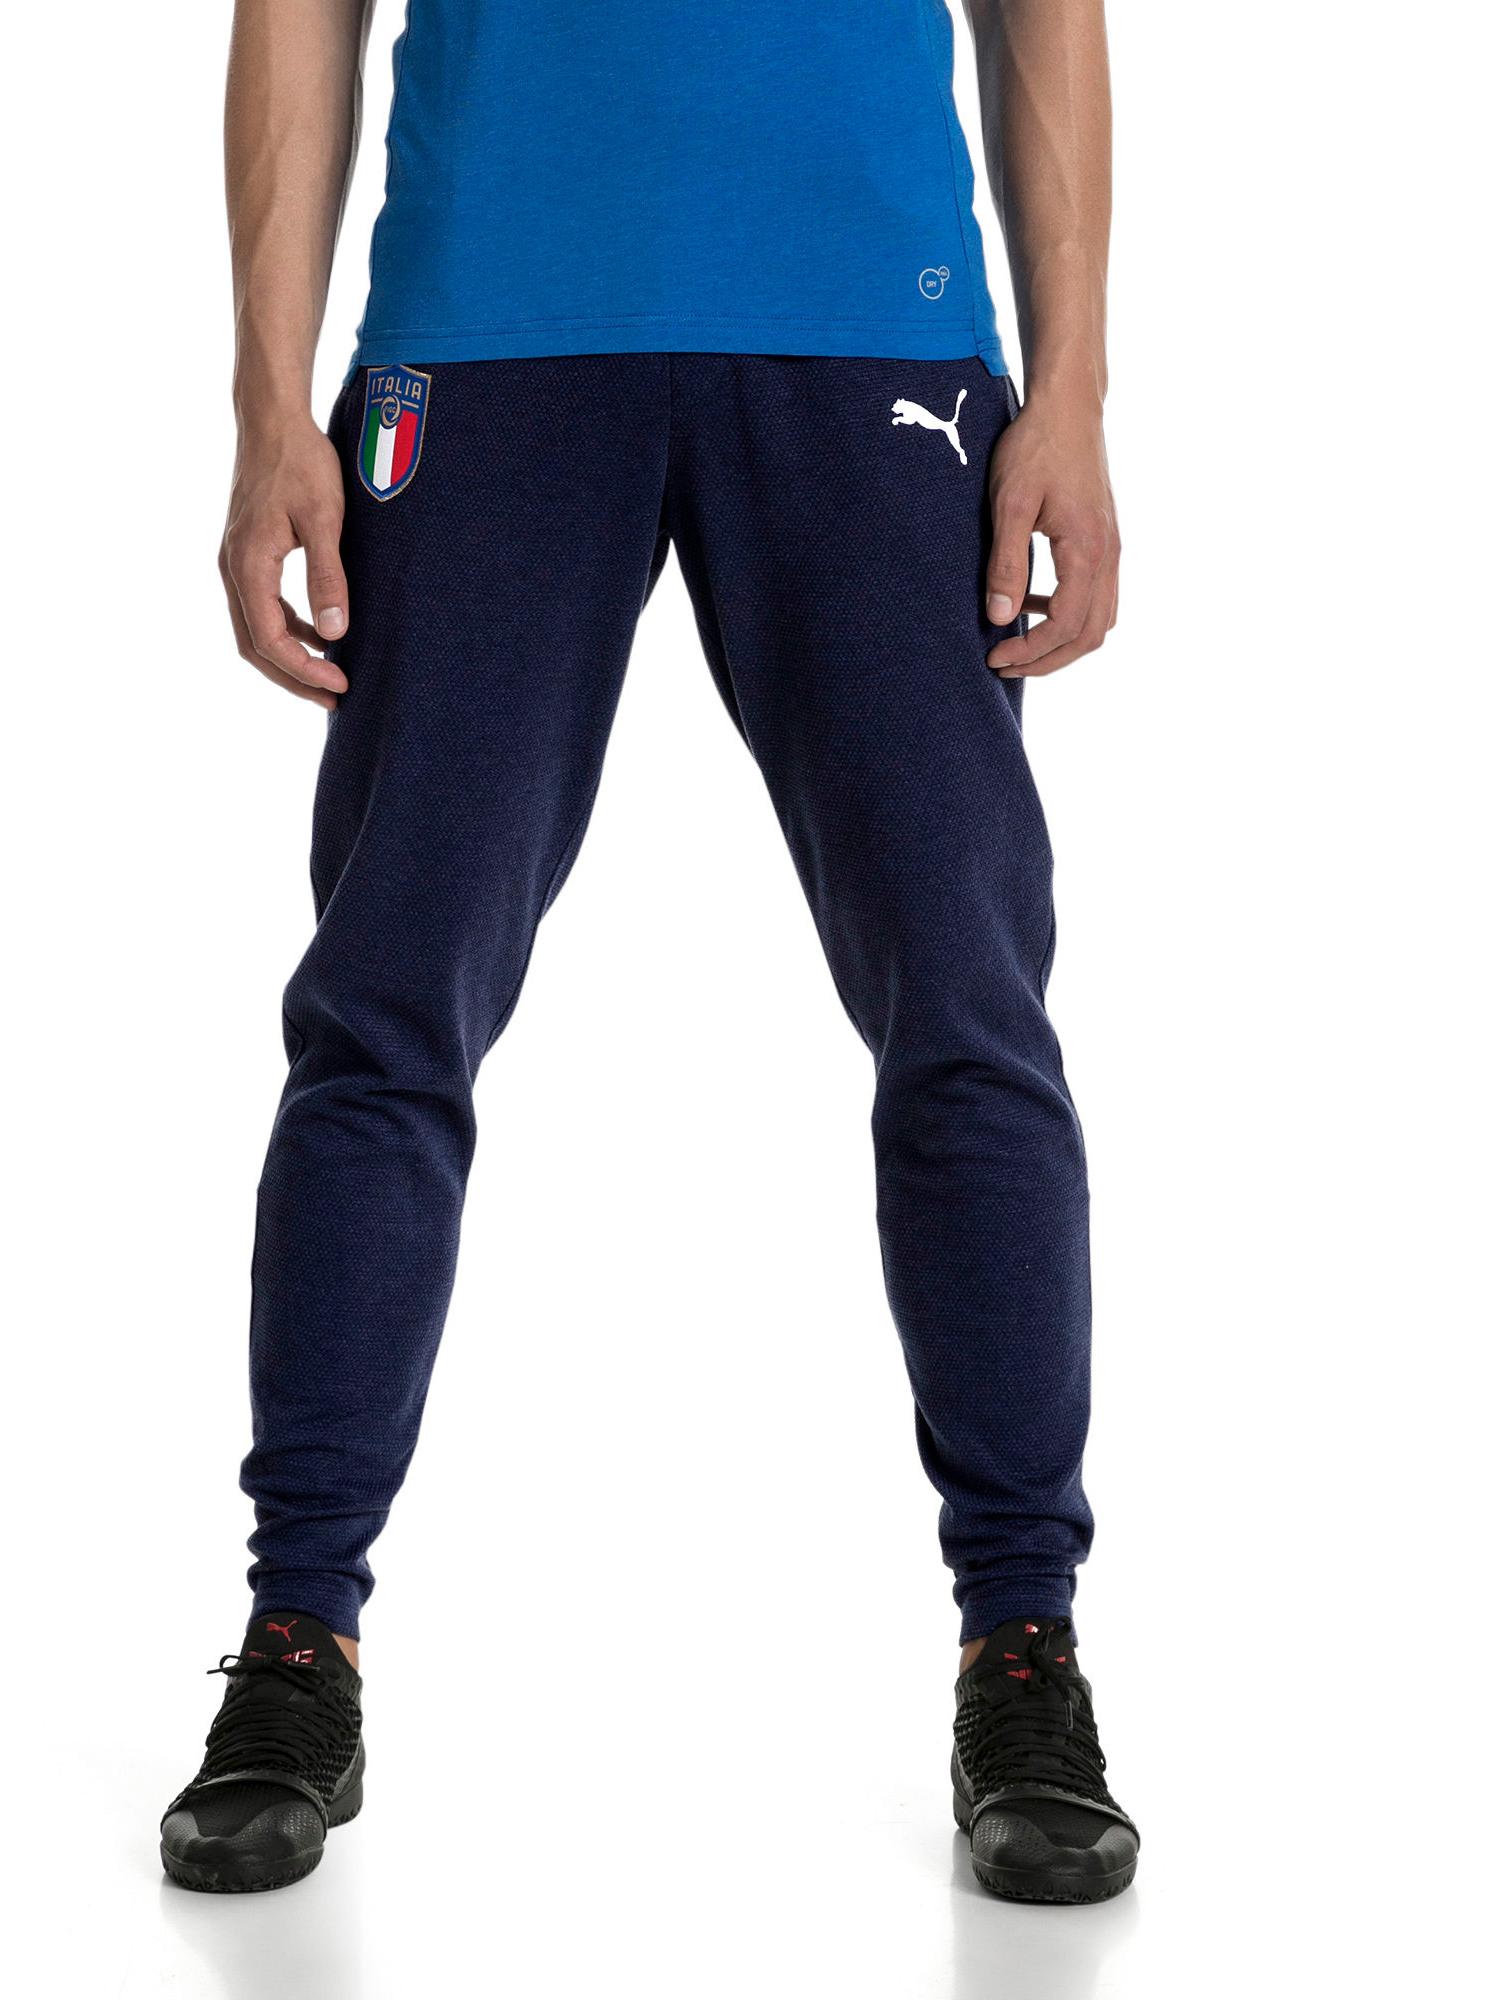 d508a9494cbb9 Italia FIGC Puma Pantaloni tuta Pants Cotone Casual Performance Sweat 2018  Blu